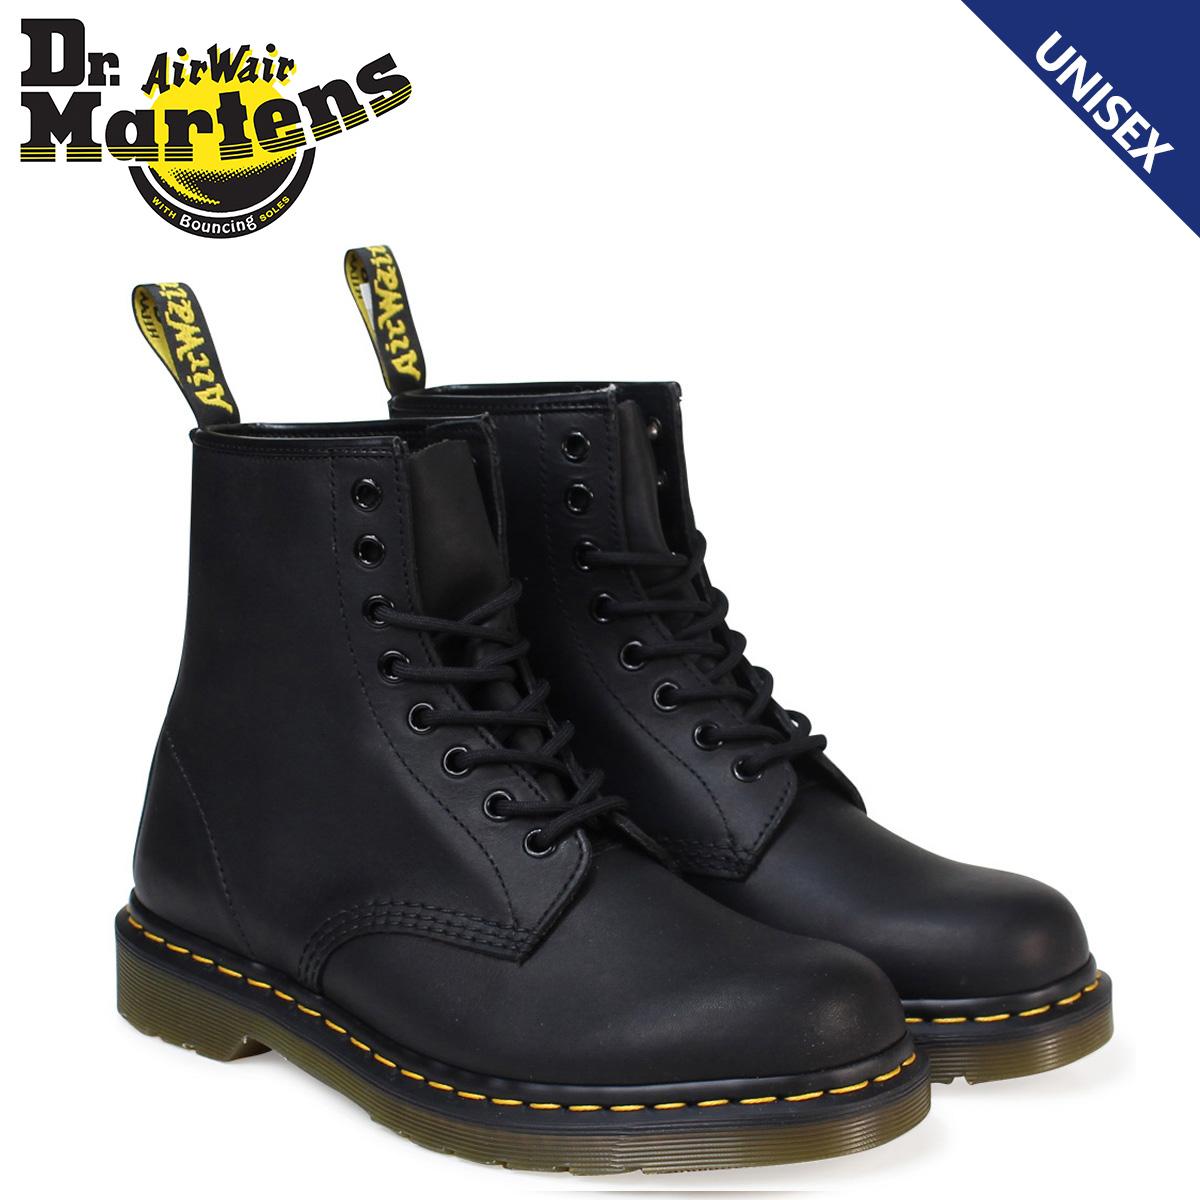 Dr.Martens ドクターマーチン 1460 8ホール ブーツ 8 EYE BOOT R11822003 メンズ レディース